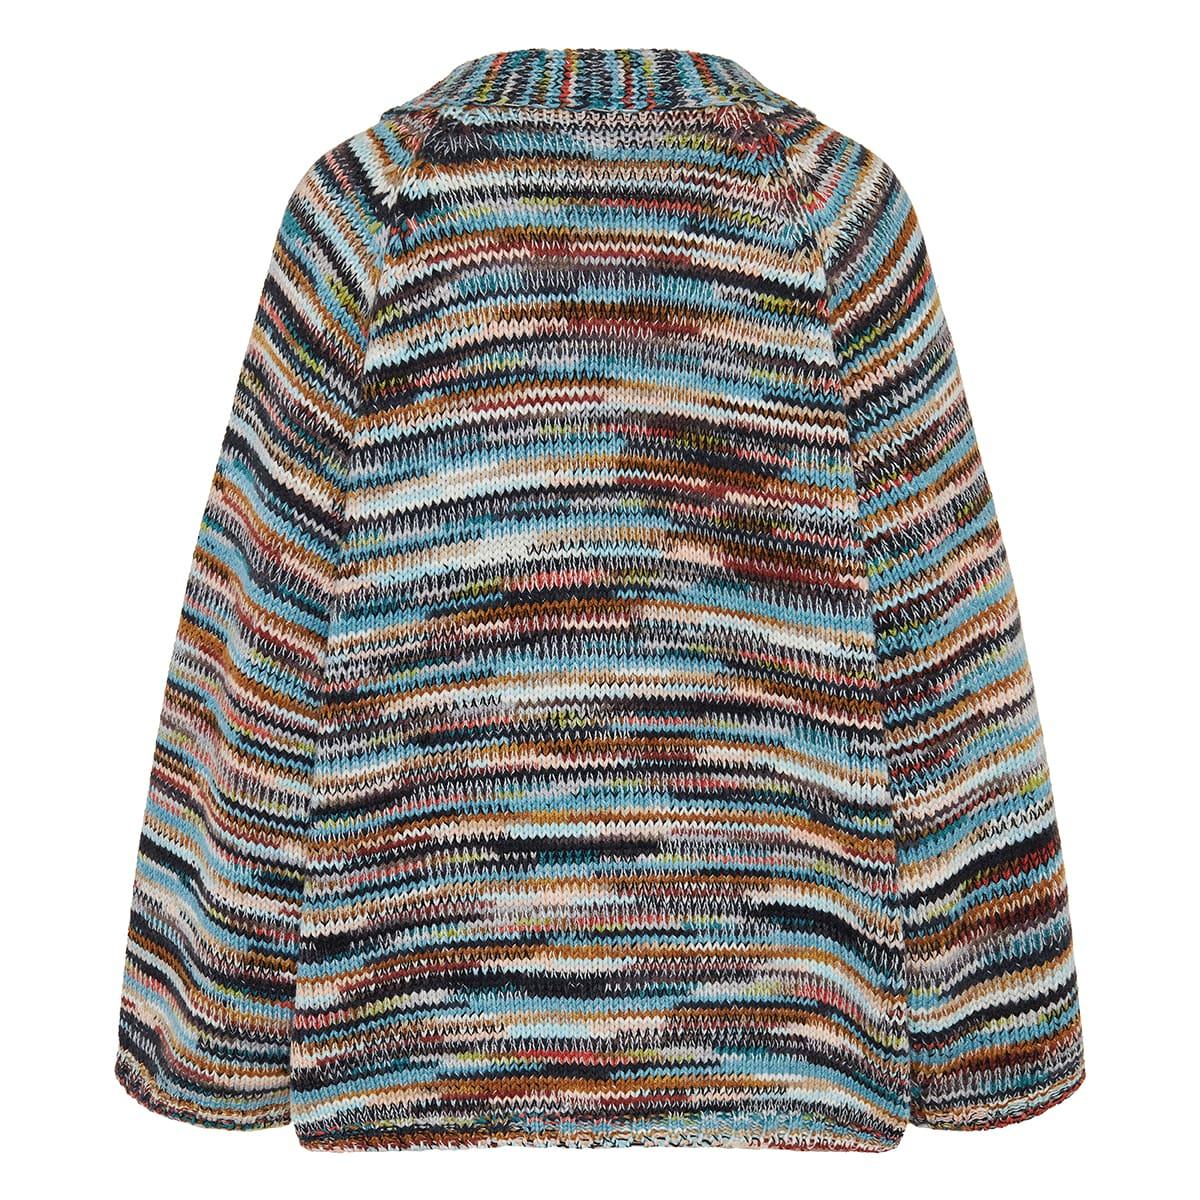 Patterned cashmere cardigan